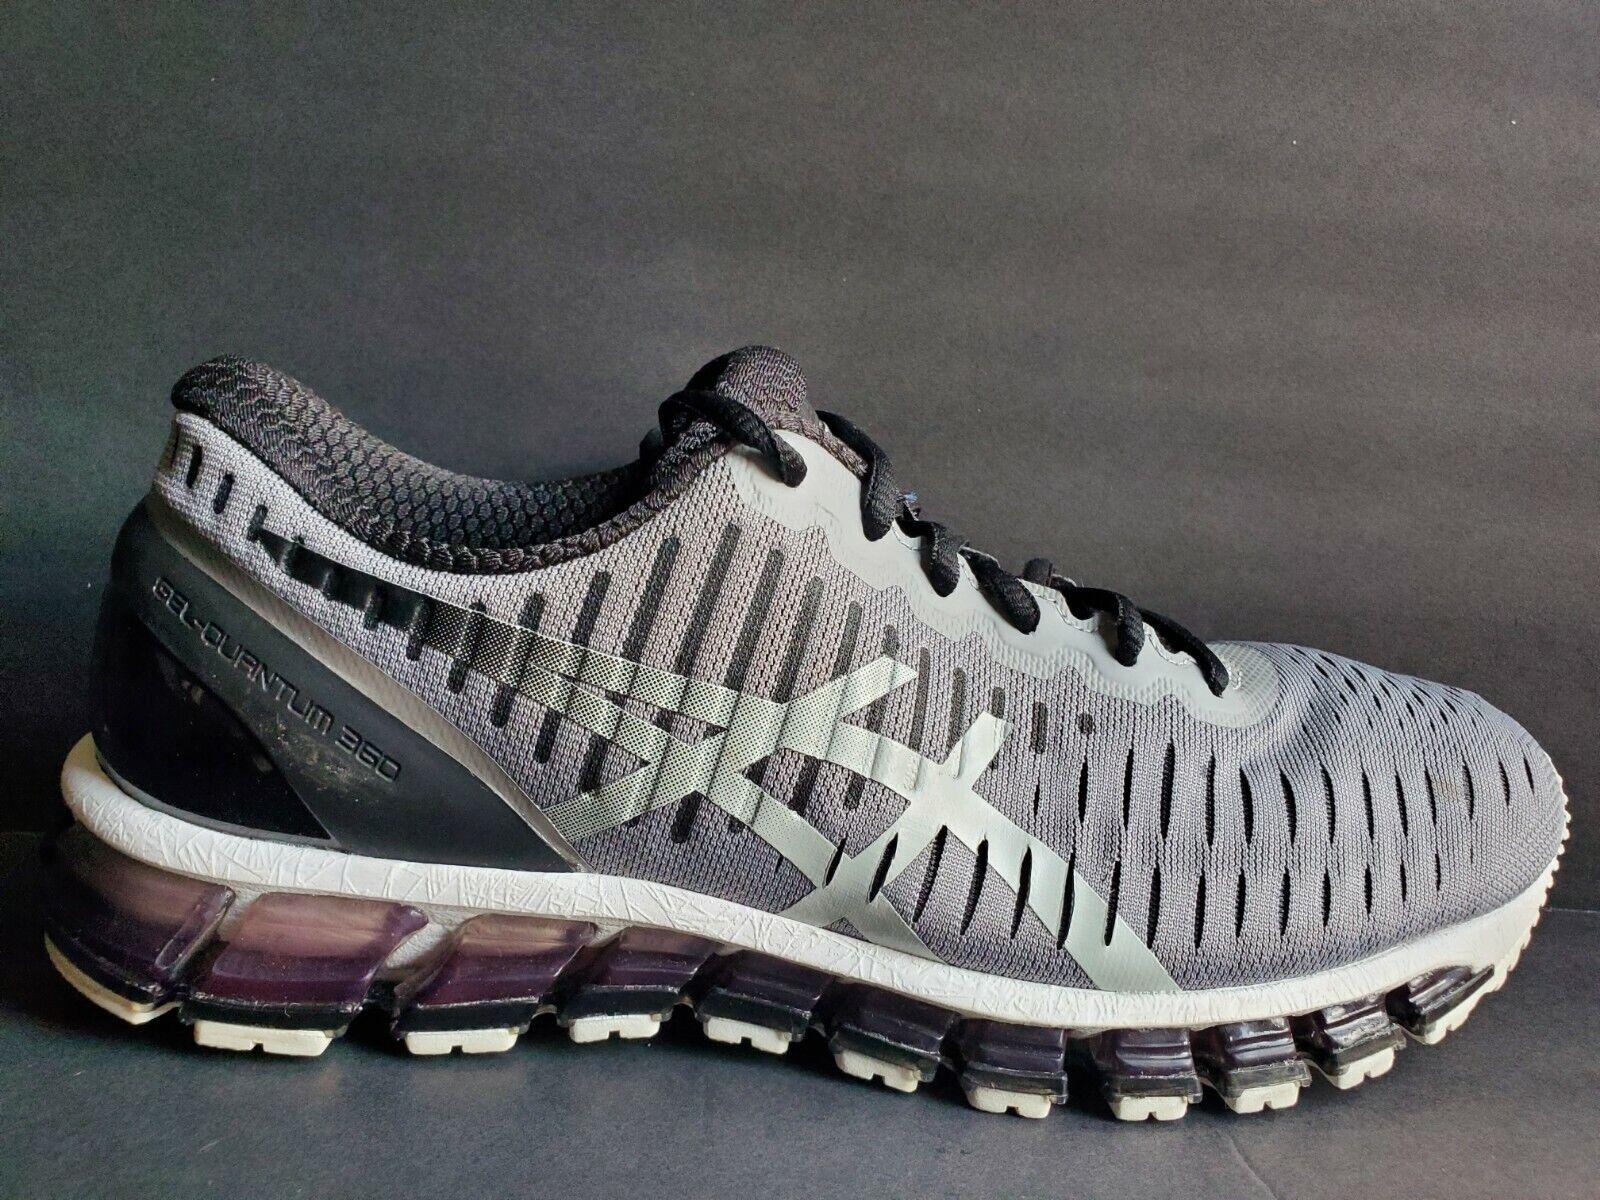 Asics Gel Quantum 360 2 Mens Size 8.5 Running shoes Black White Grey T5J1Q